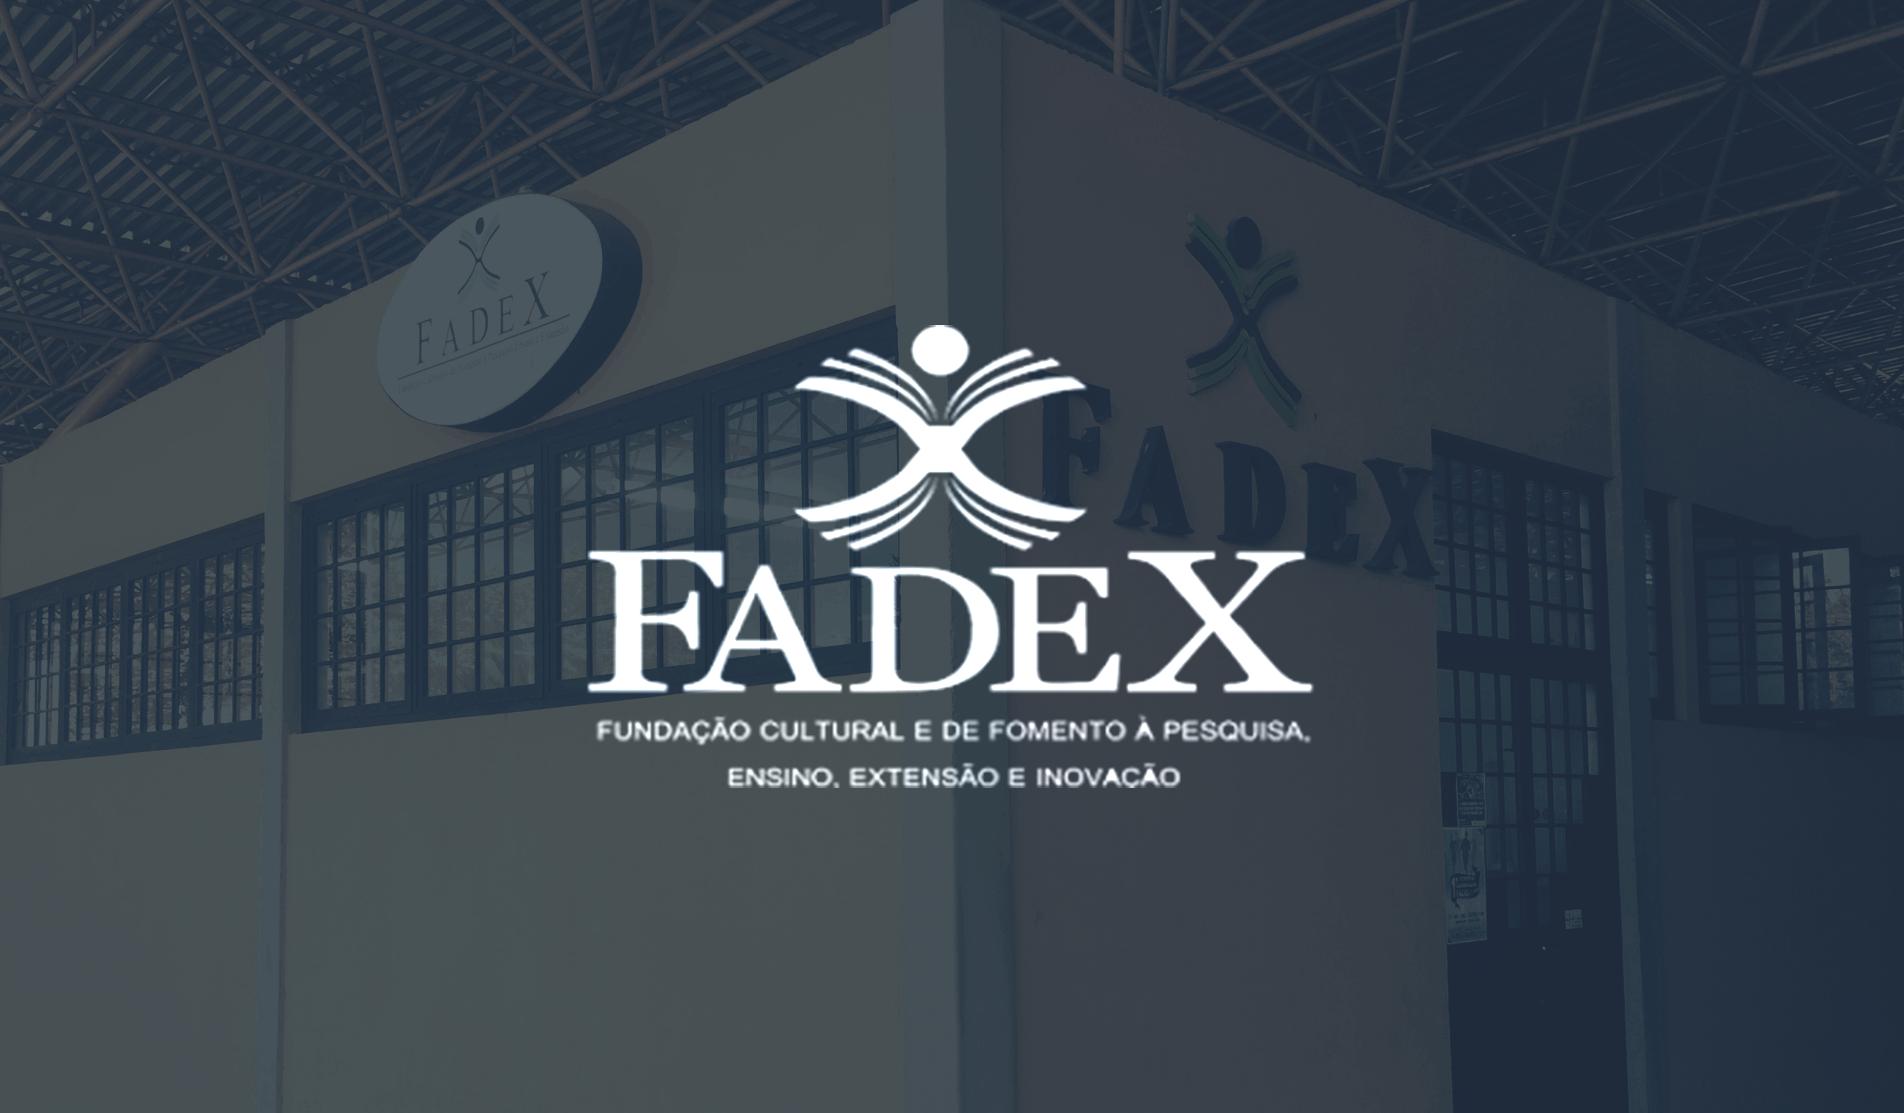 Edital – FADEX Nº 008/2019 Processo Seletivo Simplificado para apoio administrativo.